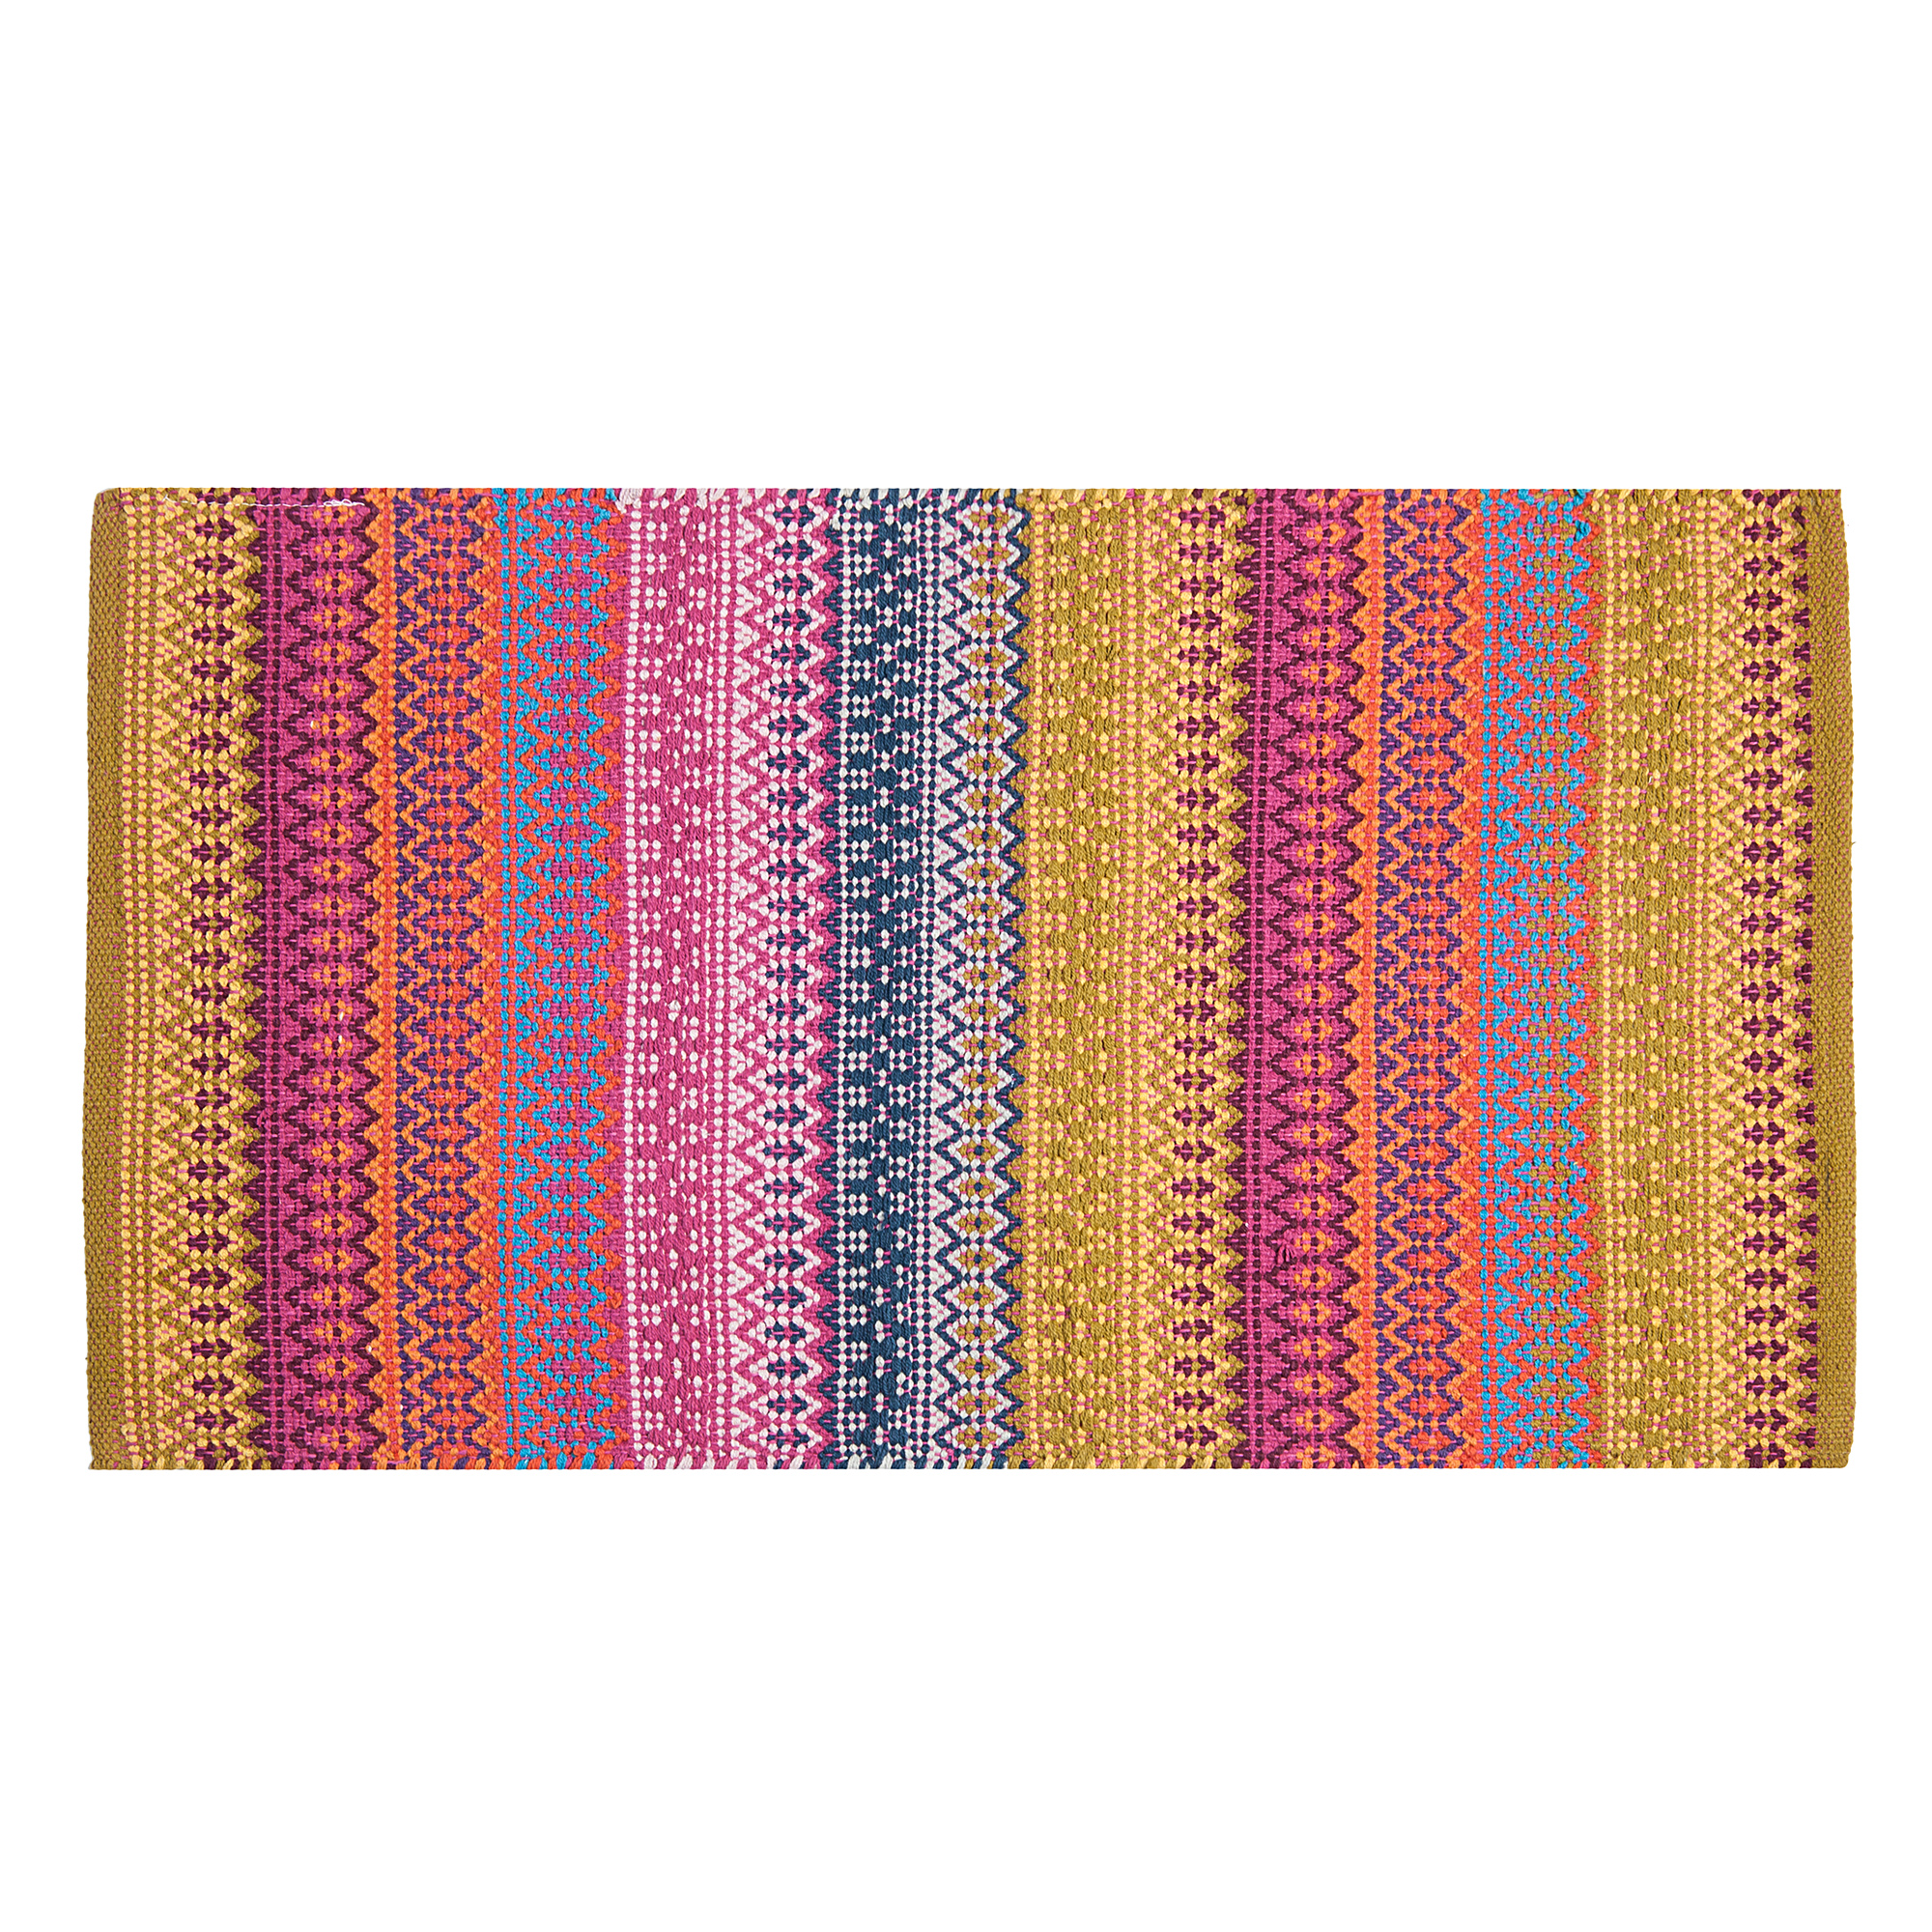 Фото - Коврик in senegal 80x50 Abc коврик серый 80x50 abc la cucina zen